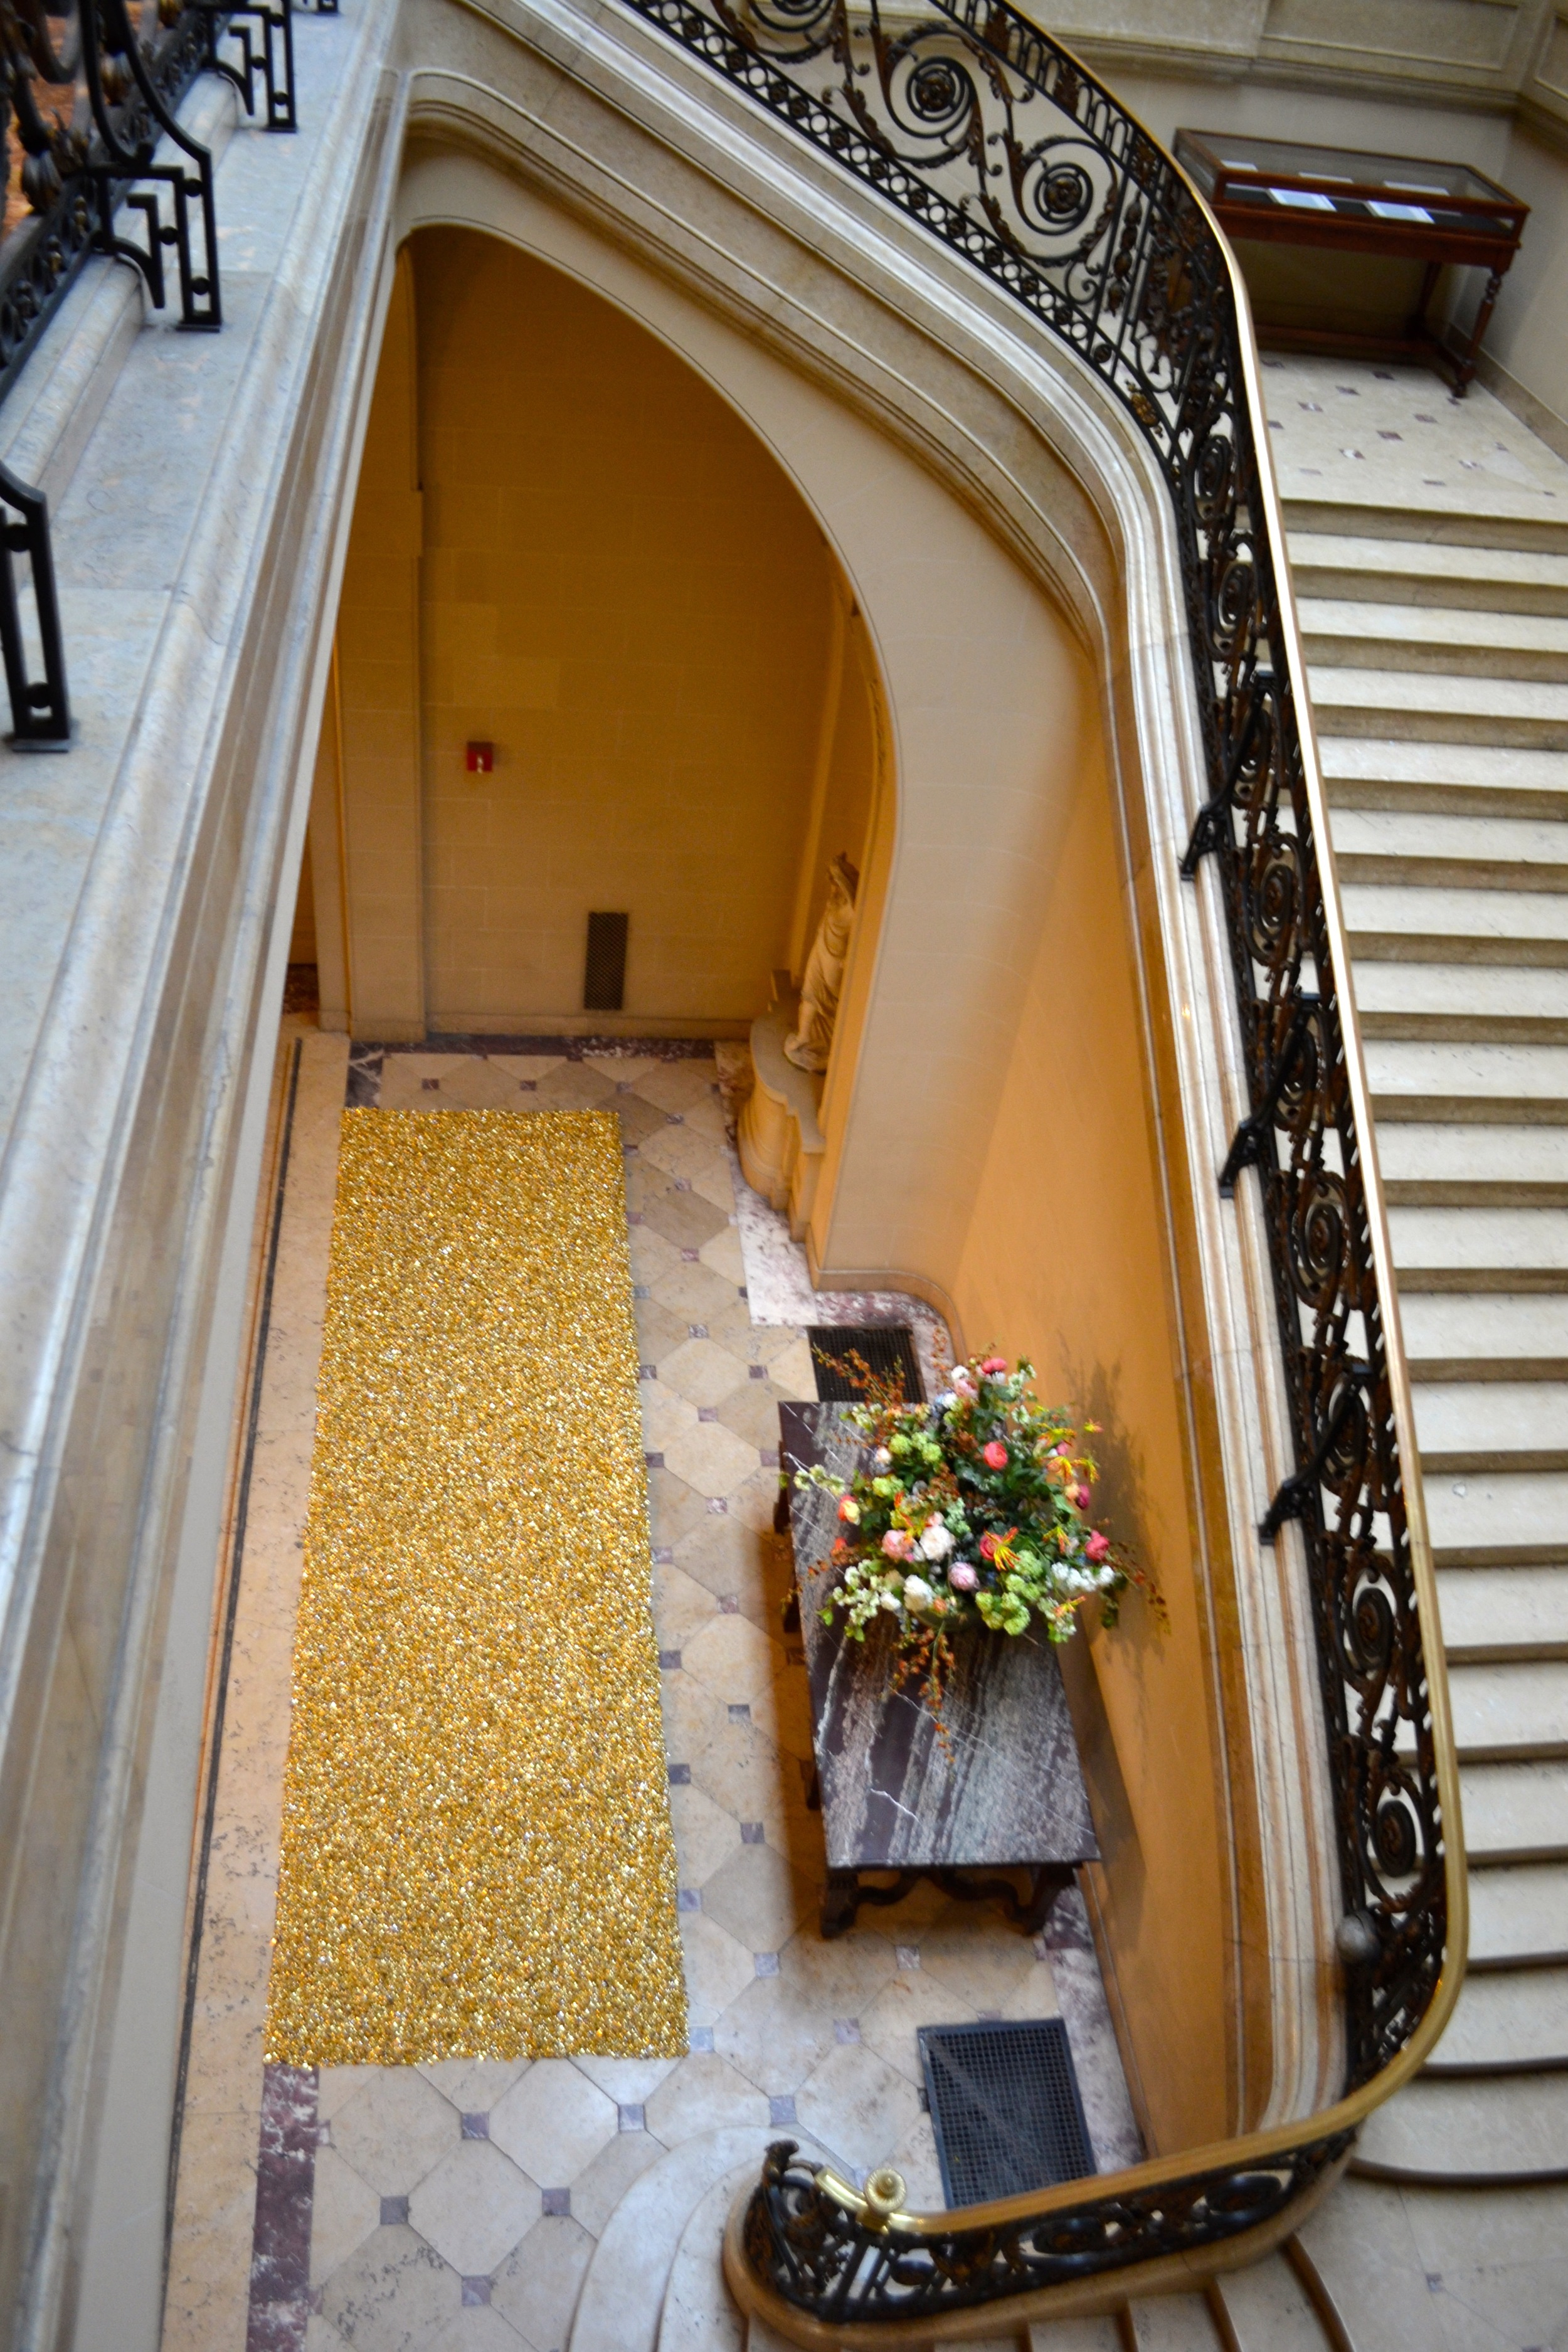 Installation view, Felix Gonzalez-Torres, Great Hall Exhibition, IFA, Spring 2015